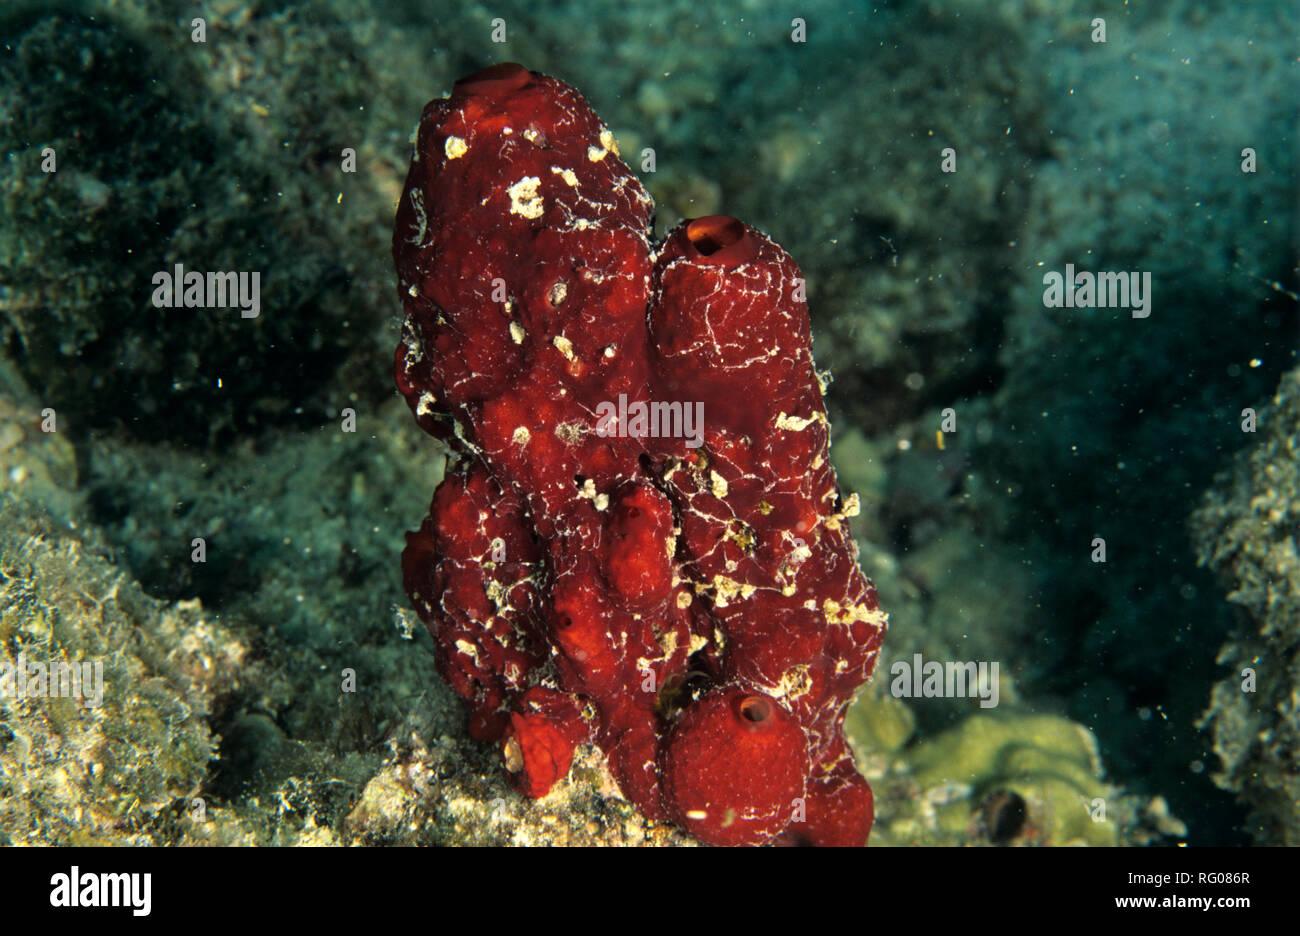 Marine, life, sea, life, ocean, plants, animals, organisms, salt, water, coastal, fundamental, level, nature, Shorelines, habitats, Oceans, living, sp - Stock Image